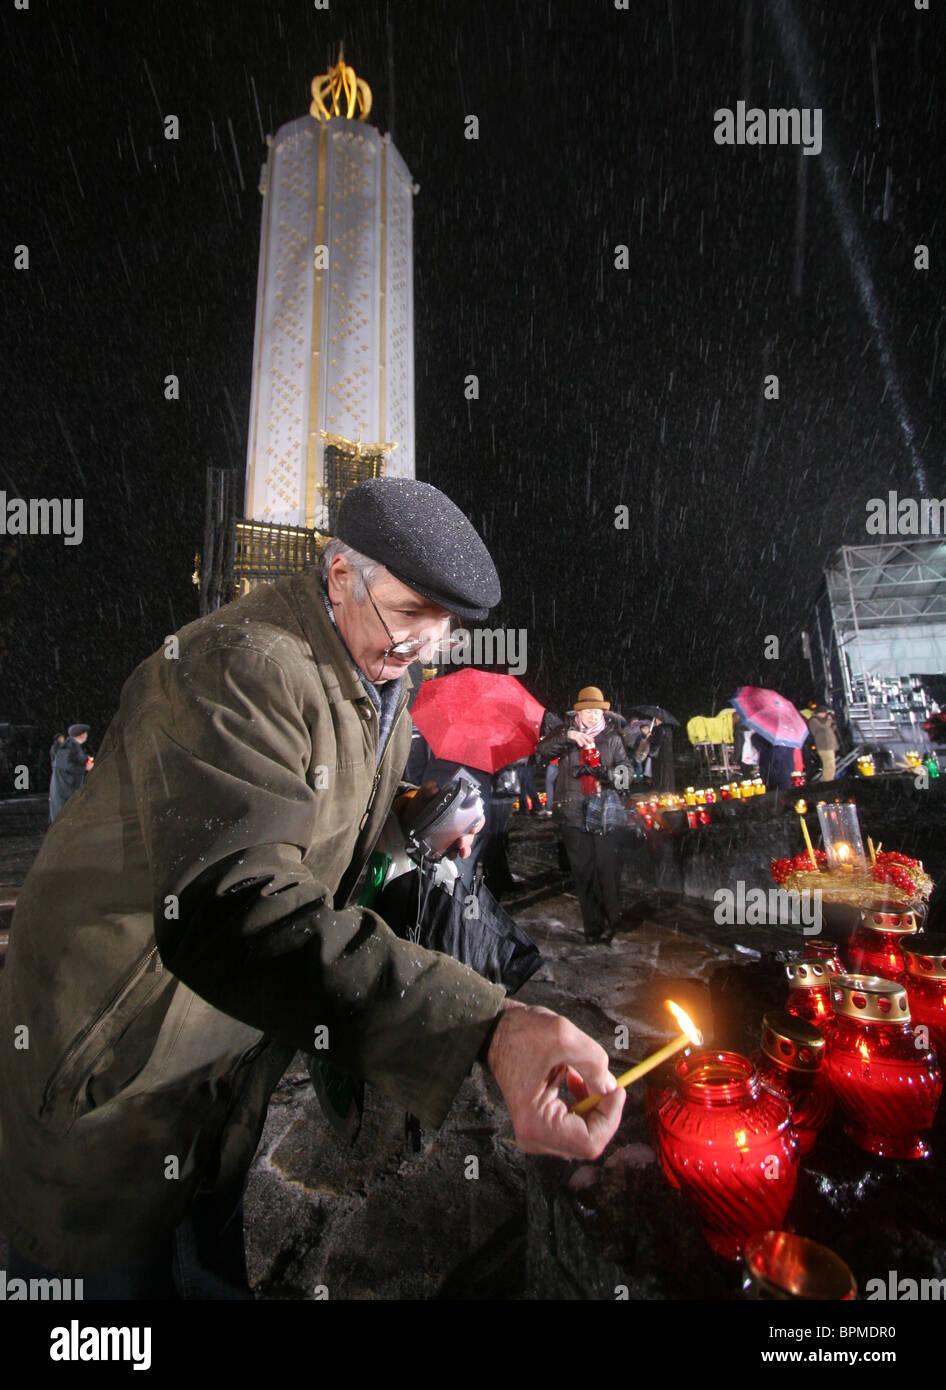 Ceremonies to commemorate 75th anniversary of Holodomor, 1932-33 famine-genocide in Ukraine - Stock Image